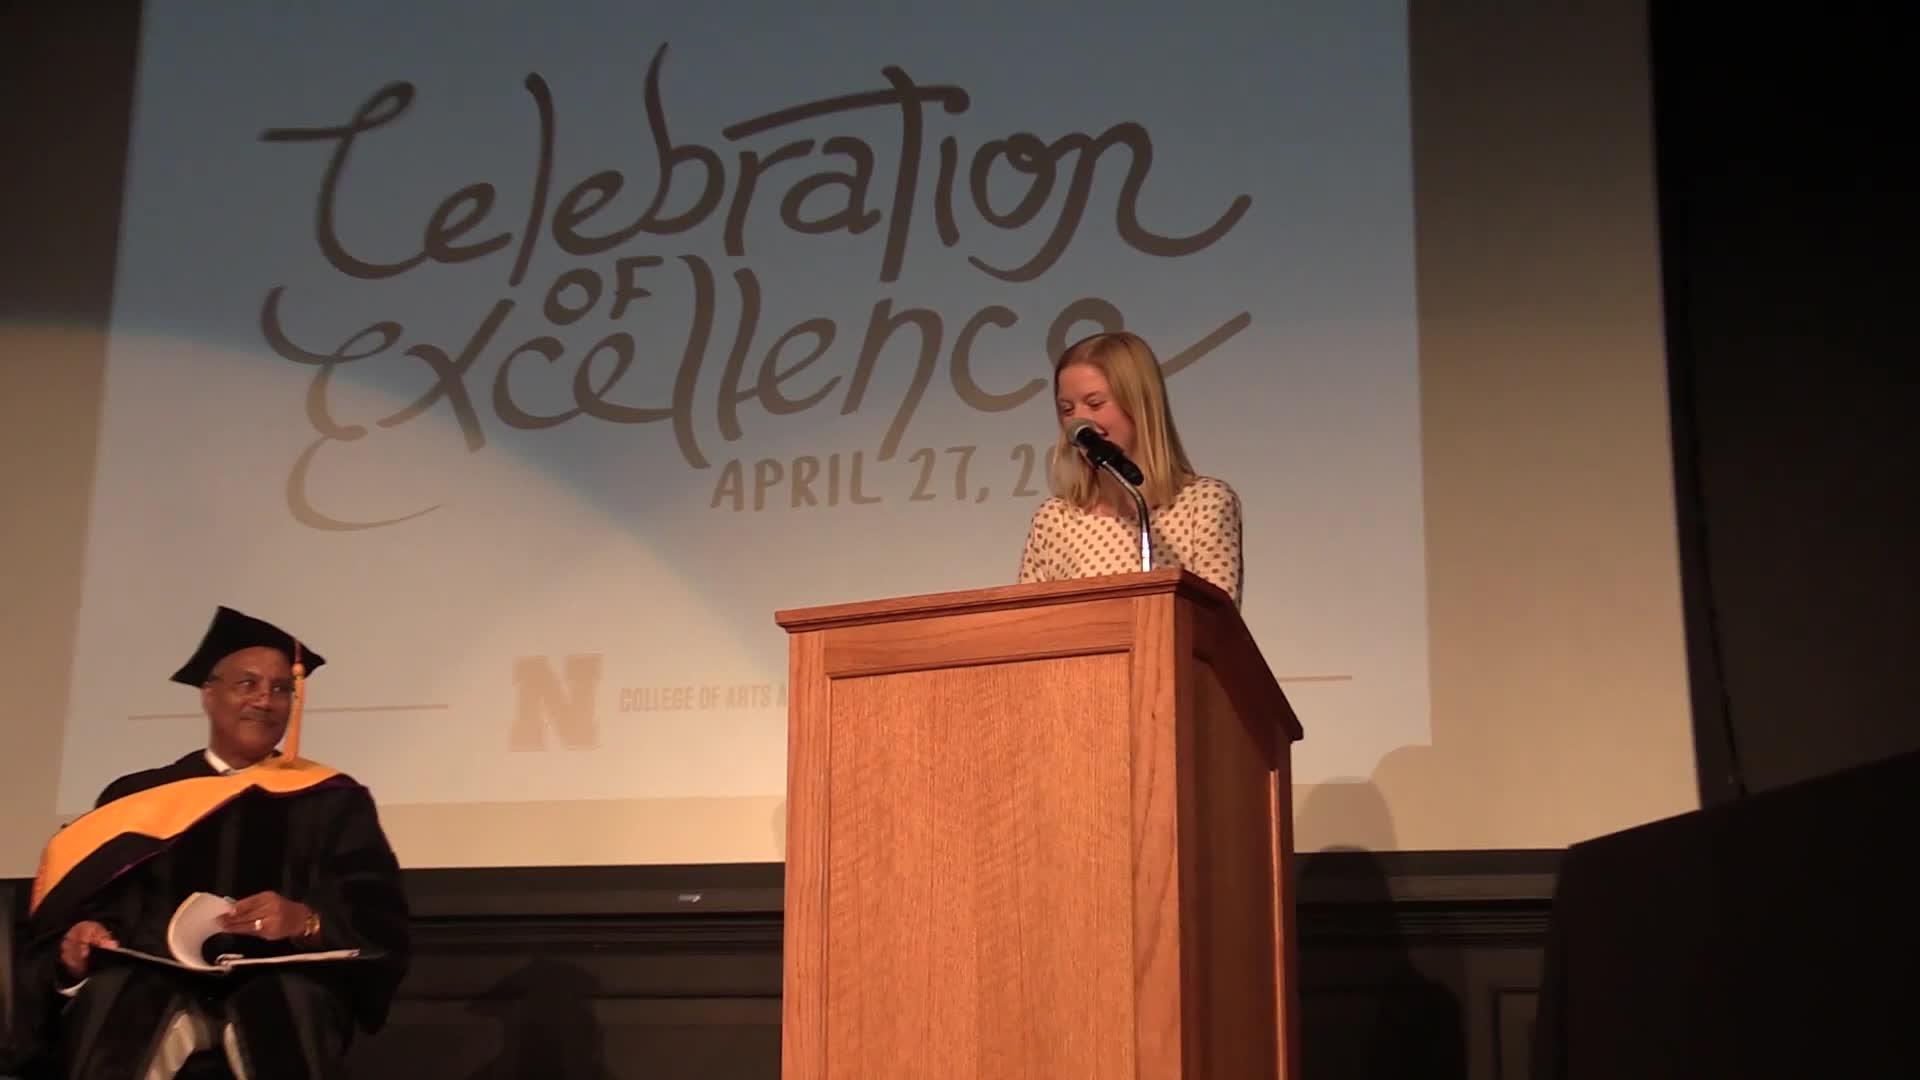 Mackenzie Strehle's senior reflection at Celebration of Excellence 2018